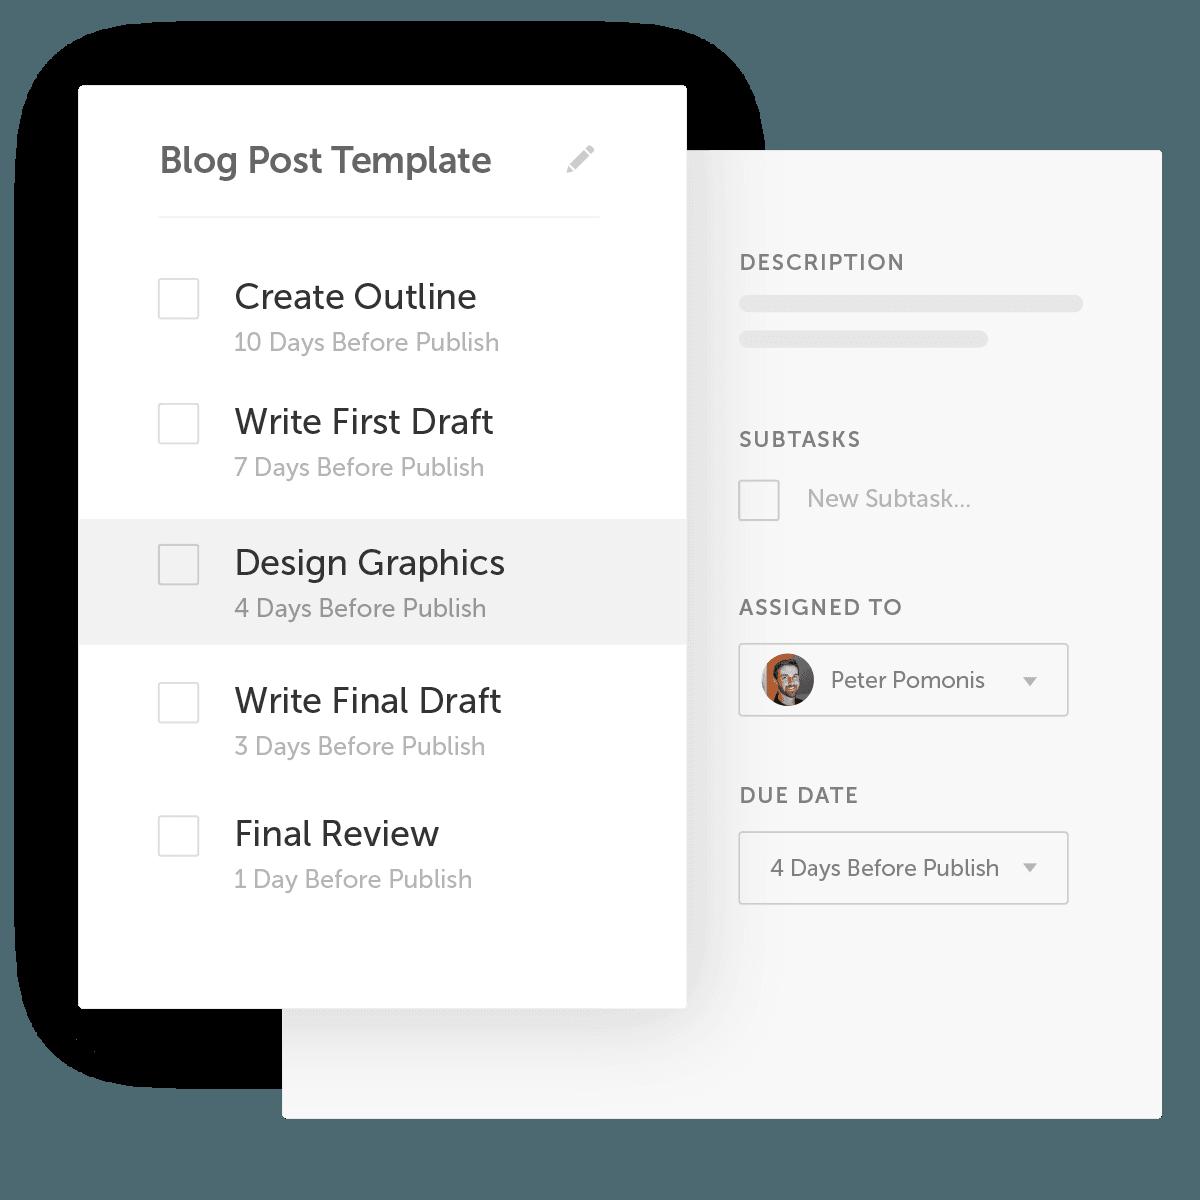 Task Templates